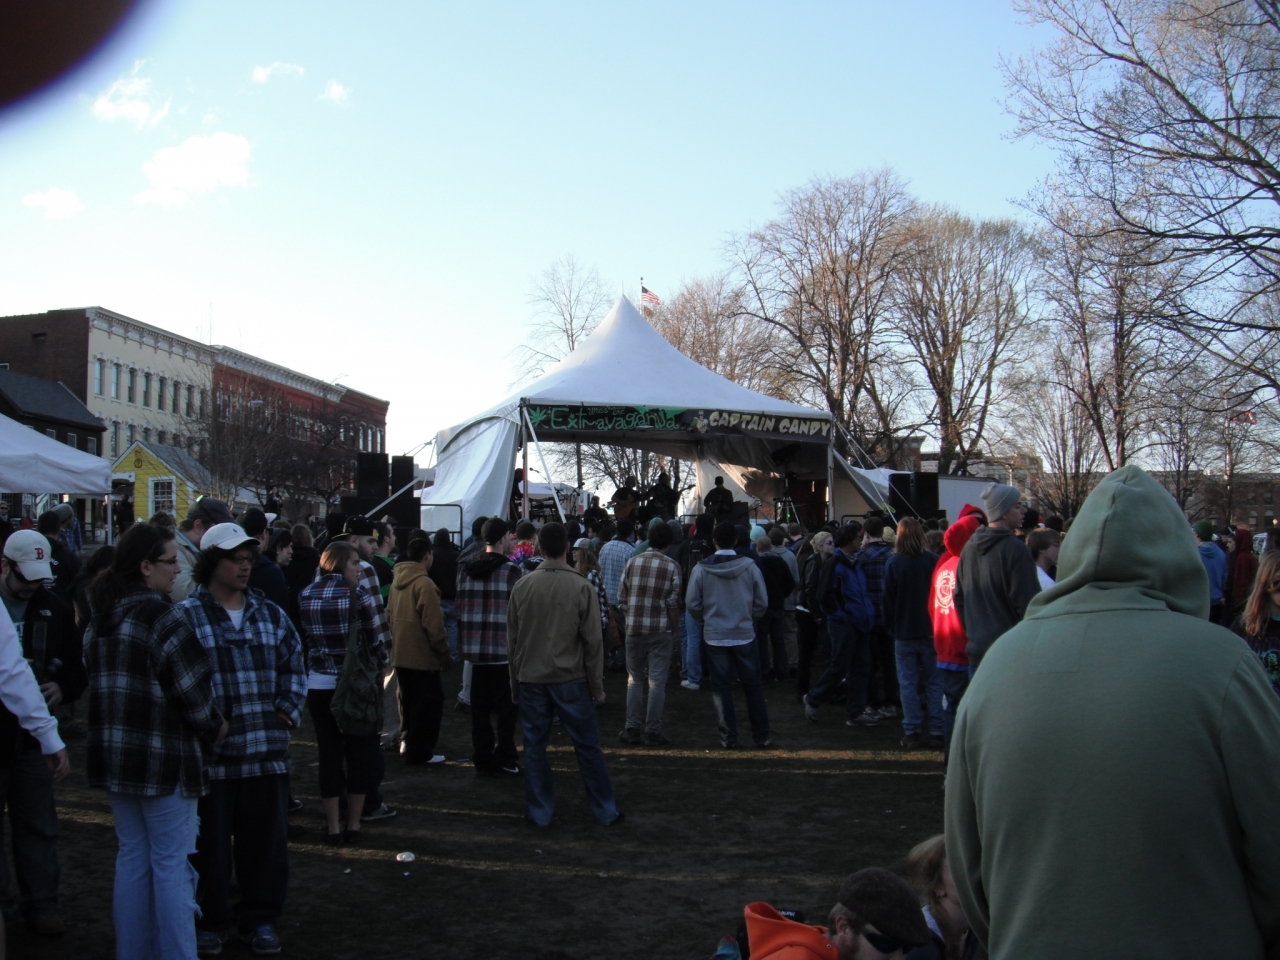 extravaganja 2011 - main stage 3